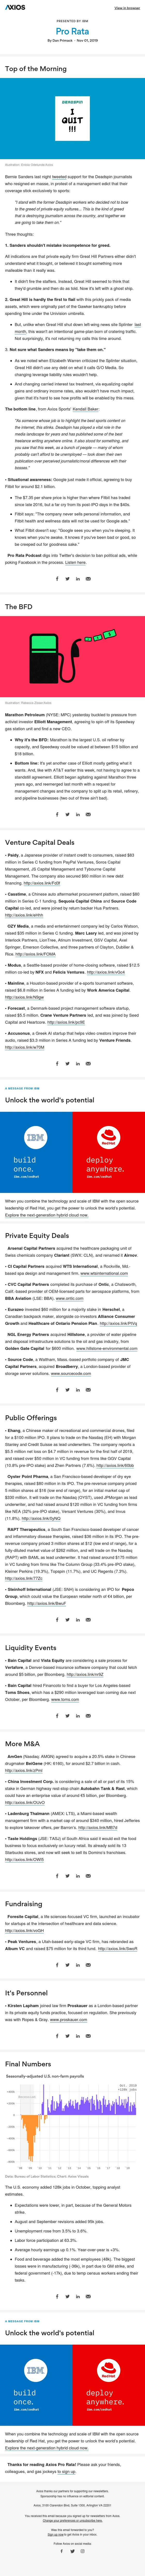 Axios Pro Rata: Bernie's Deadspin — Marathon splits — Google buys Fitbit